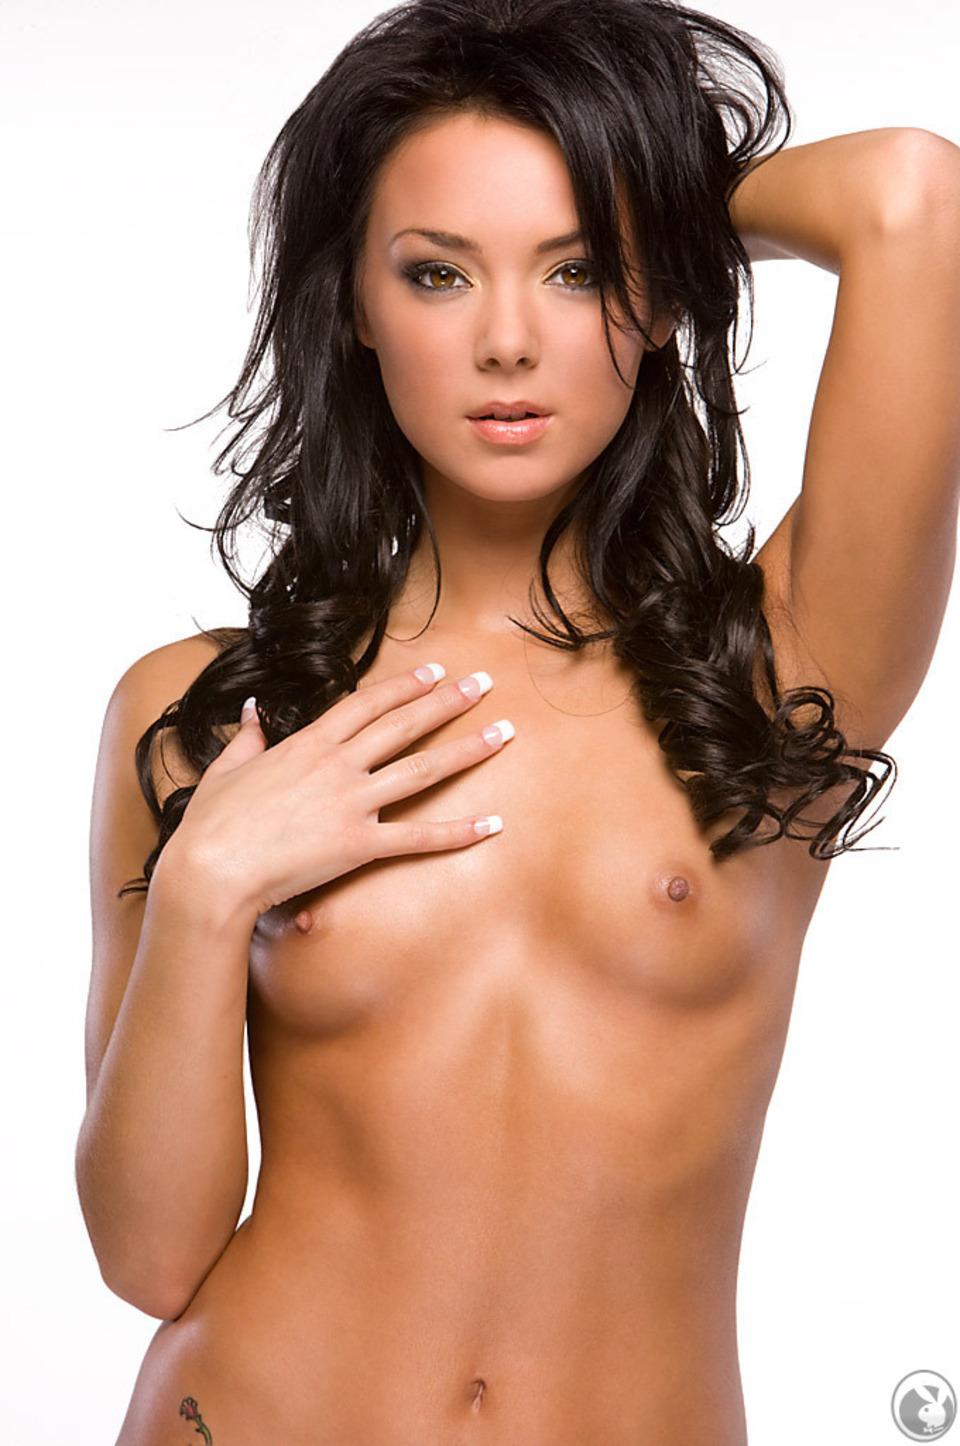 Lana taylor naked videos, video family sex